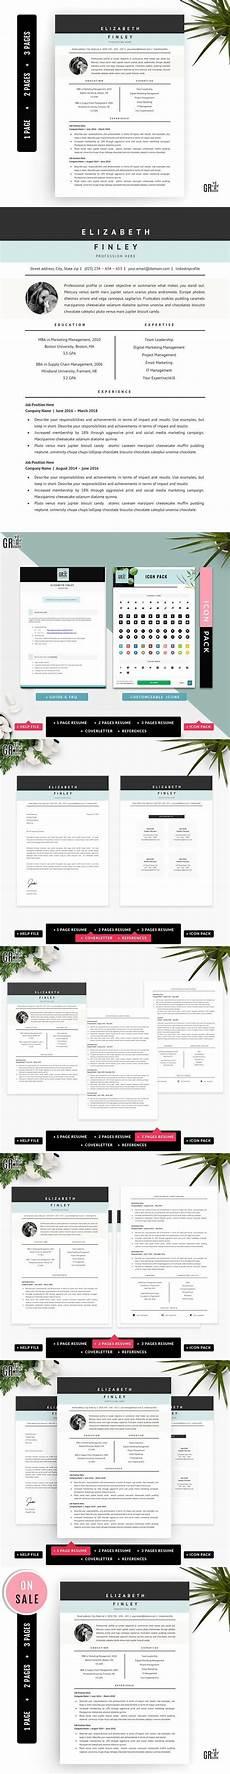 Microsoft Resume Maker Professional Resume Template 40 Professional Resume